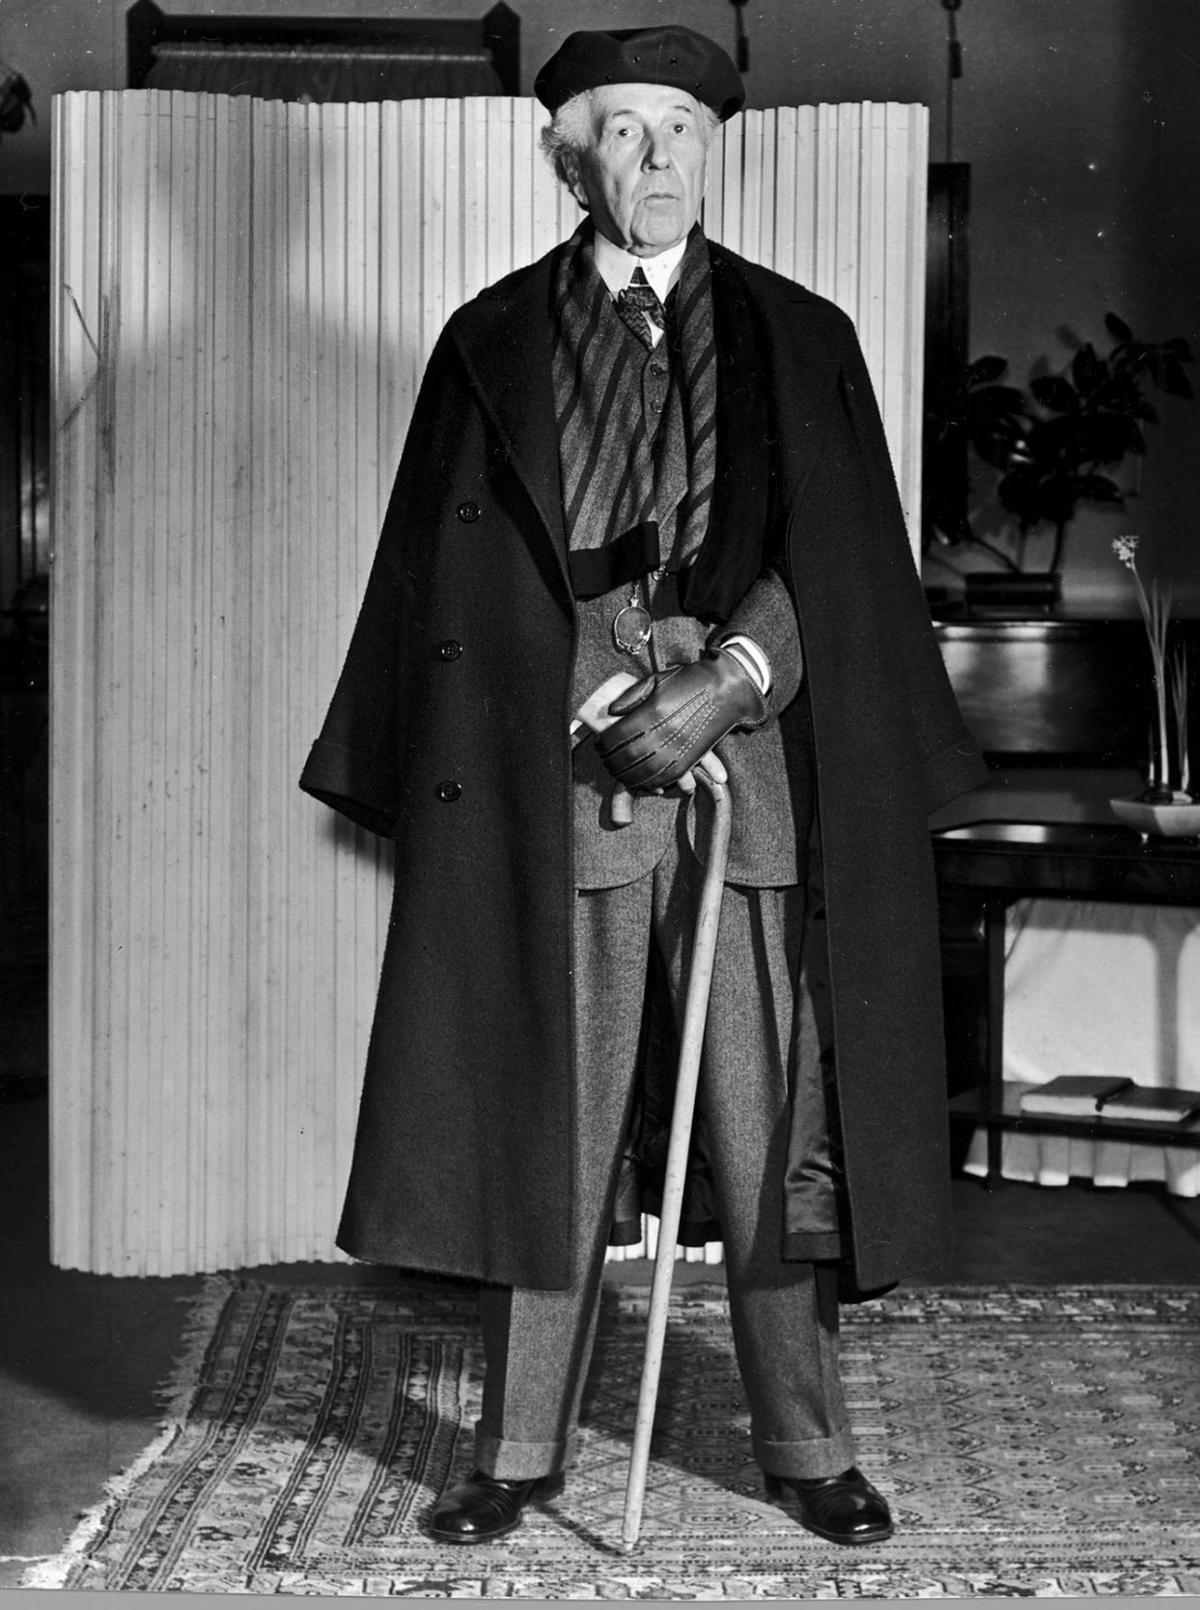 Frank Lloyd Wright, in January 1939 in St. Louis